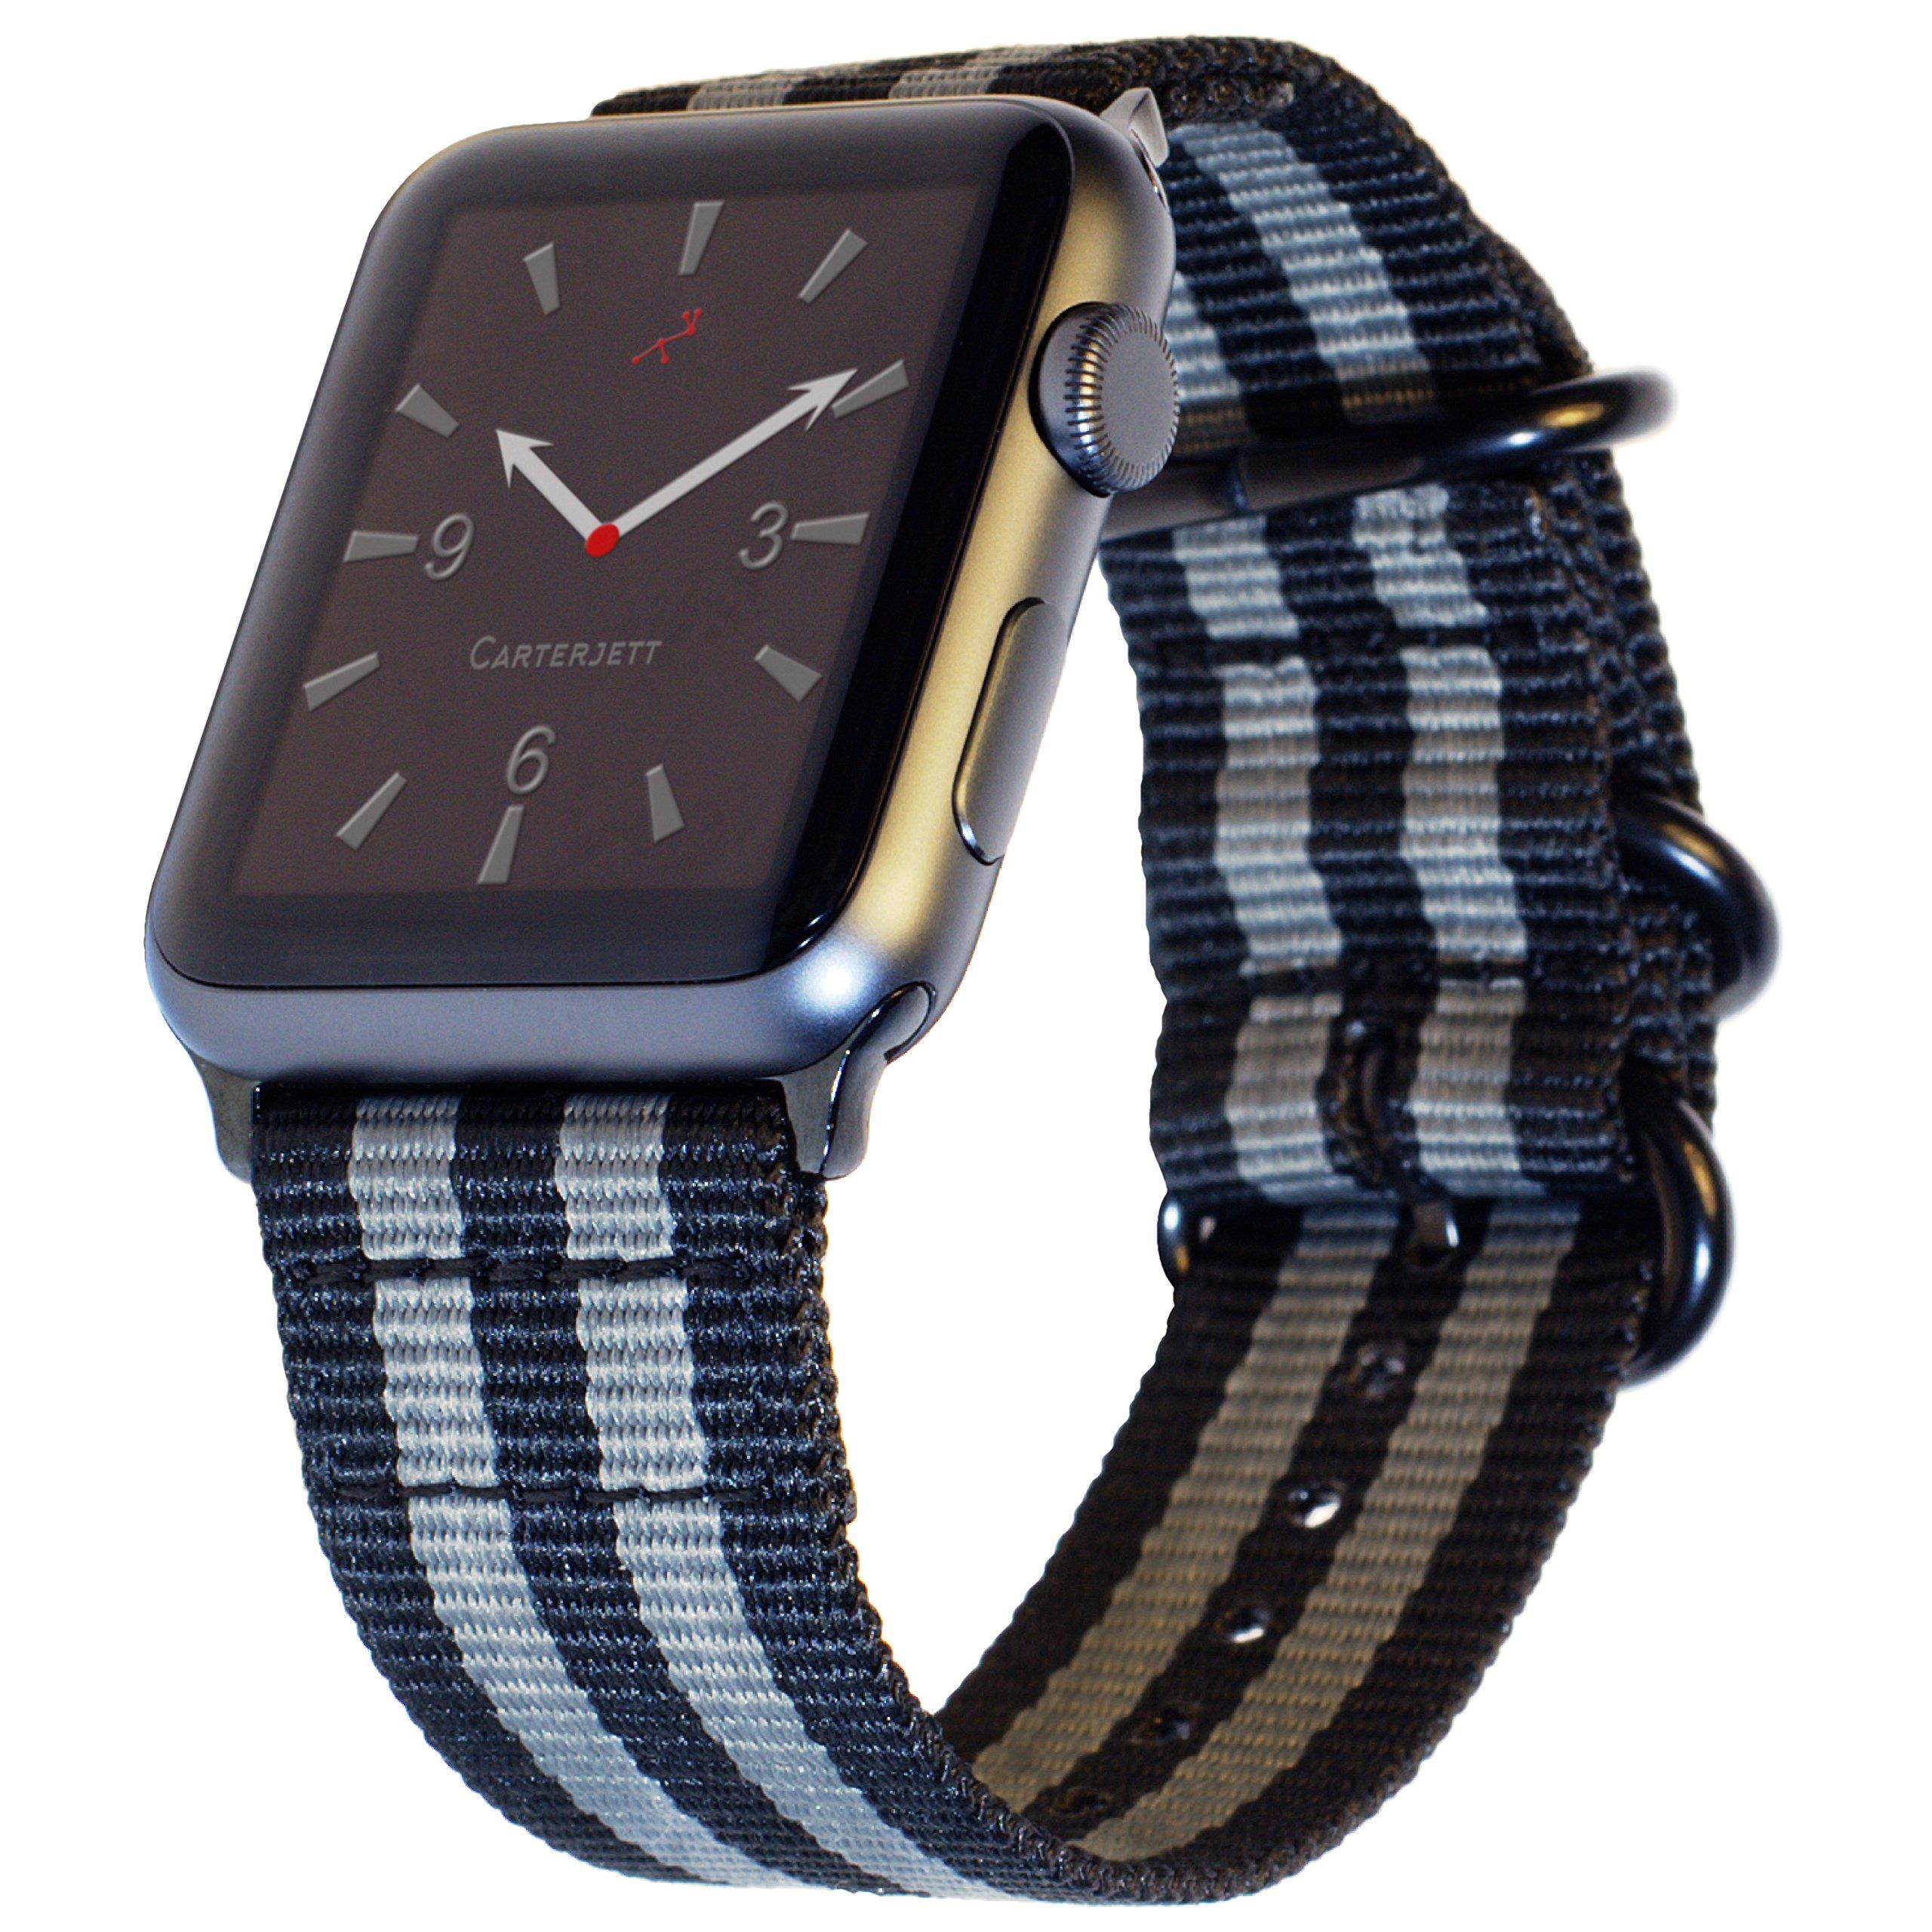 Malla Nylon Para Apple Watch (42/44mm) Carterjett [75wp6zmk]